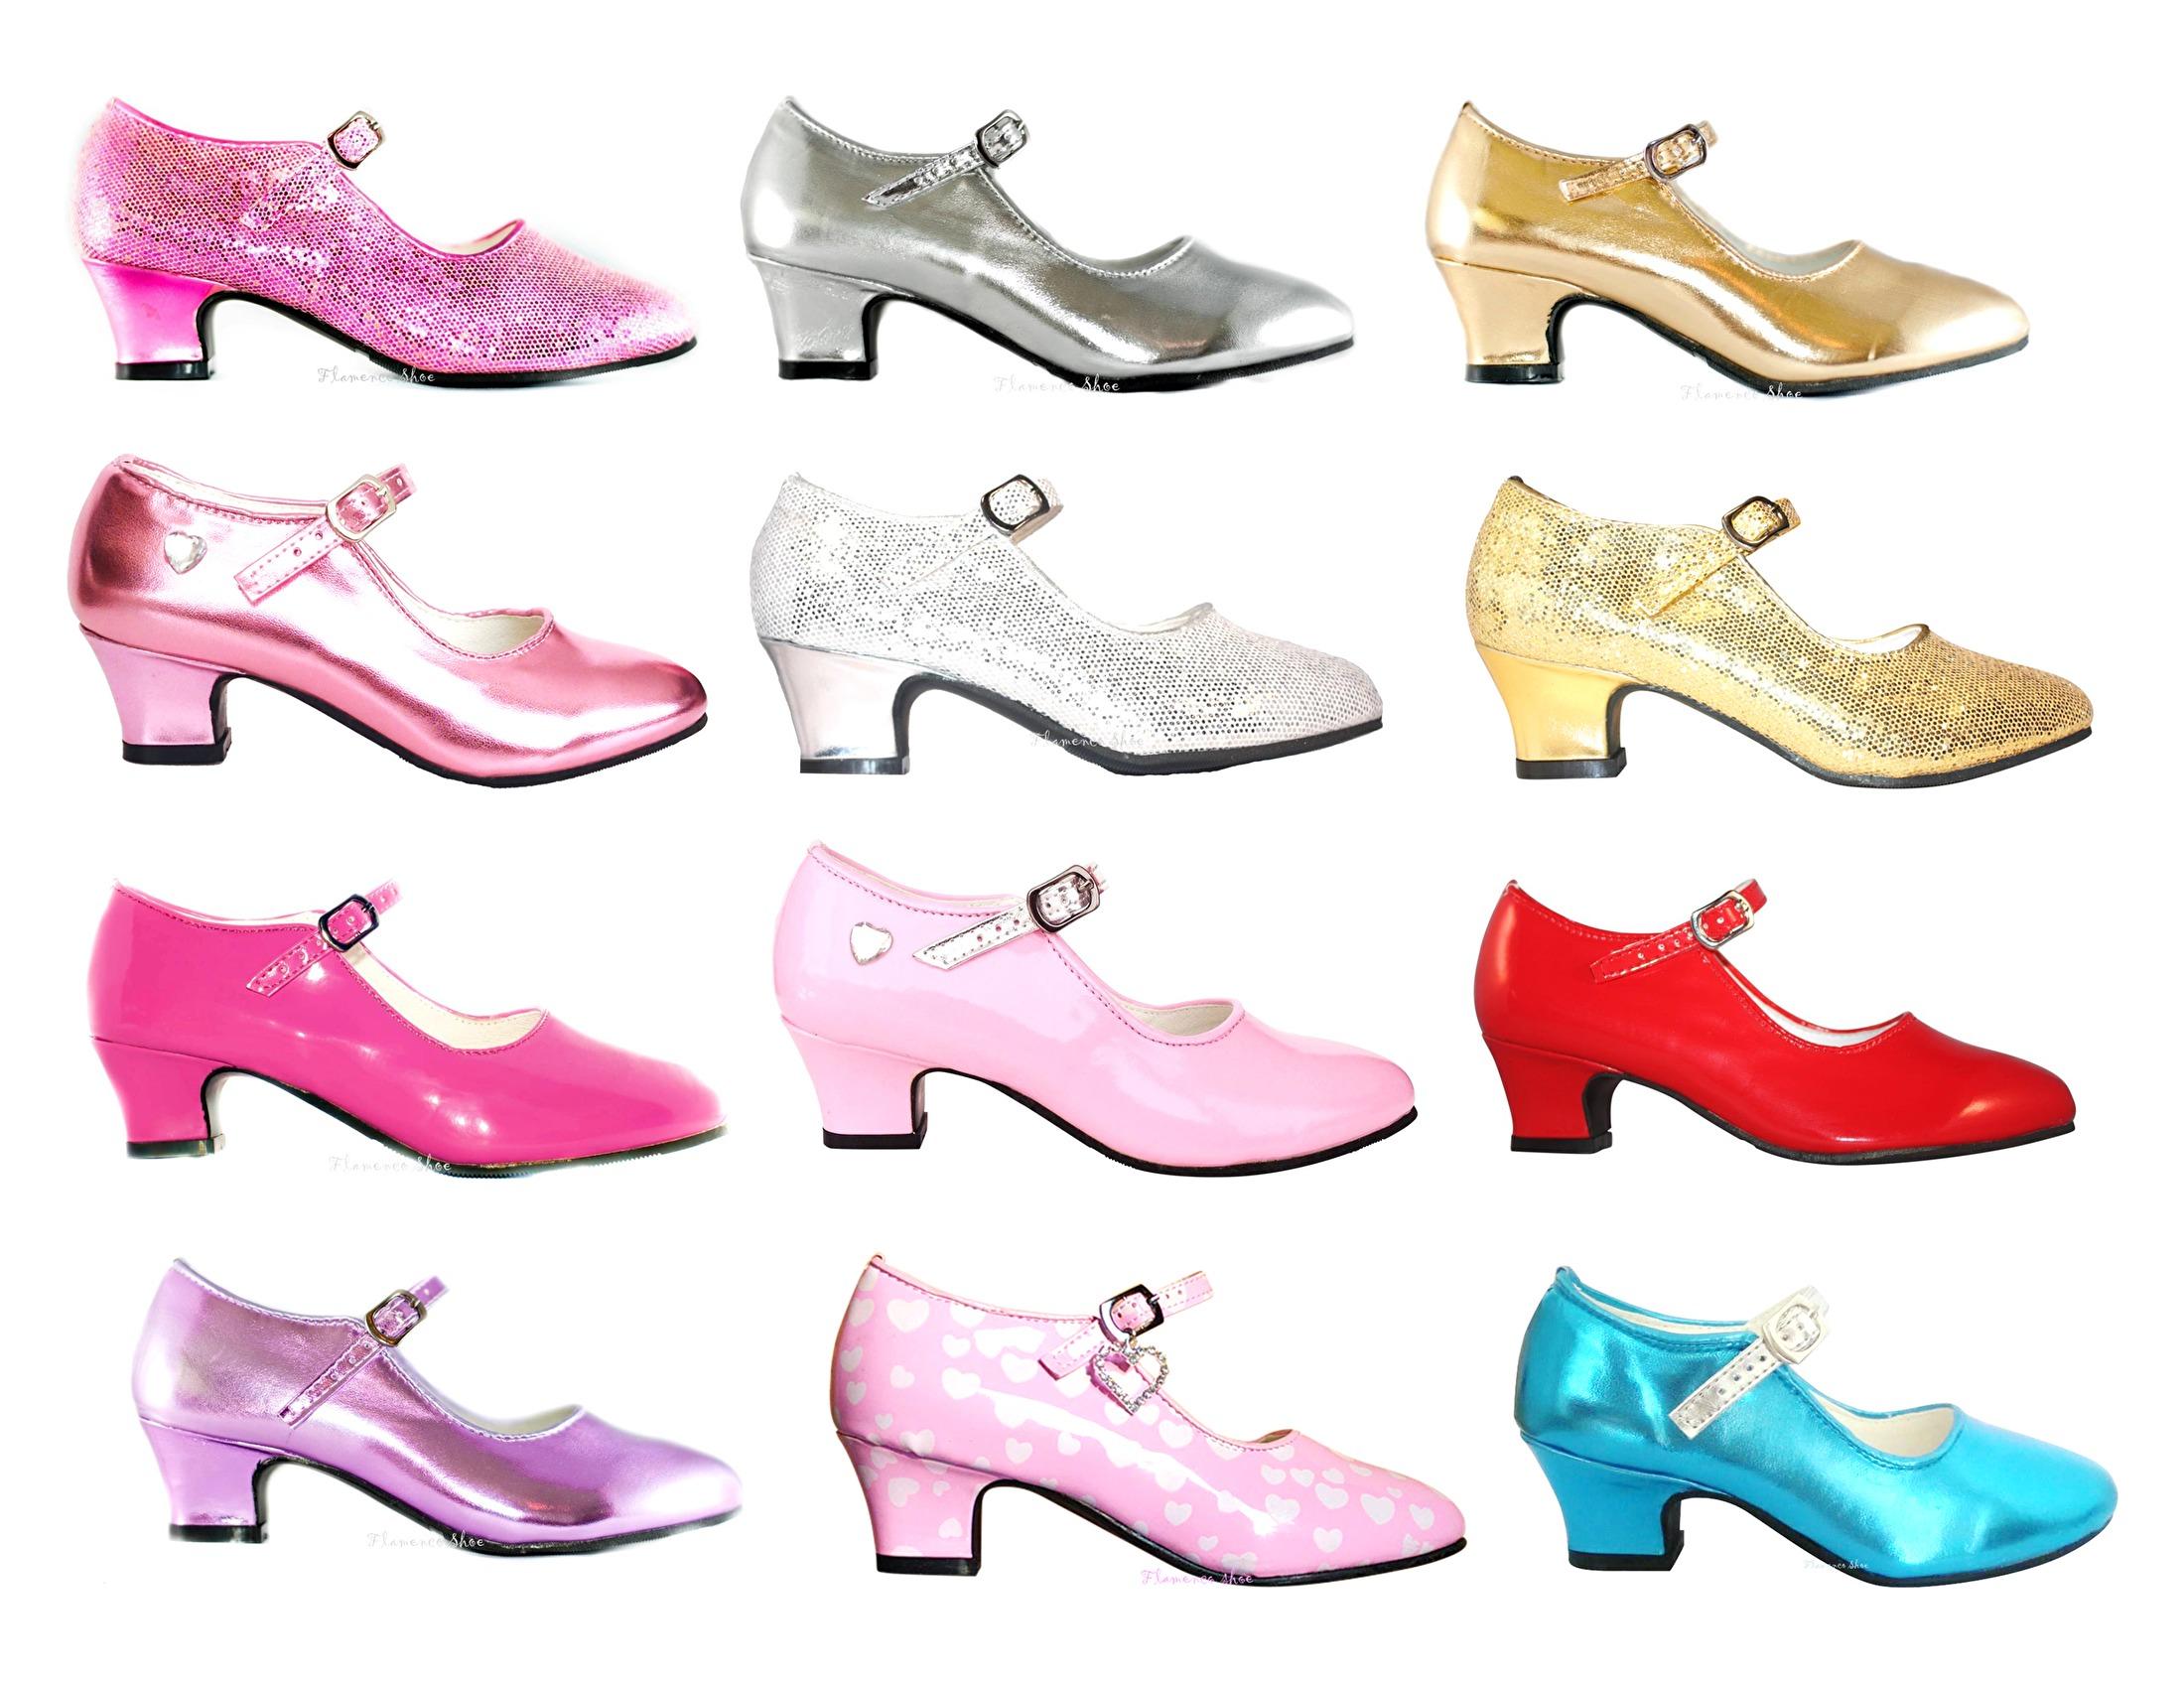 Prinsessen schoenen overzicht